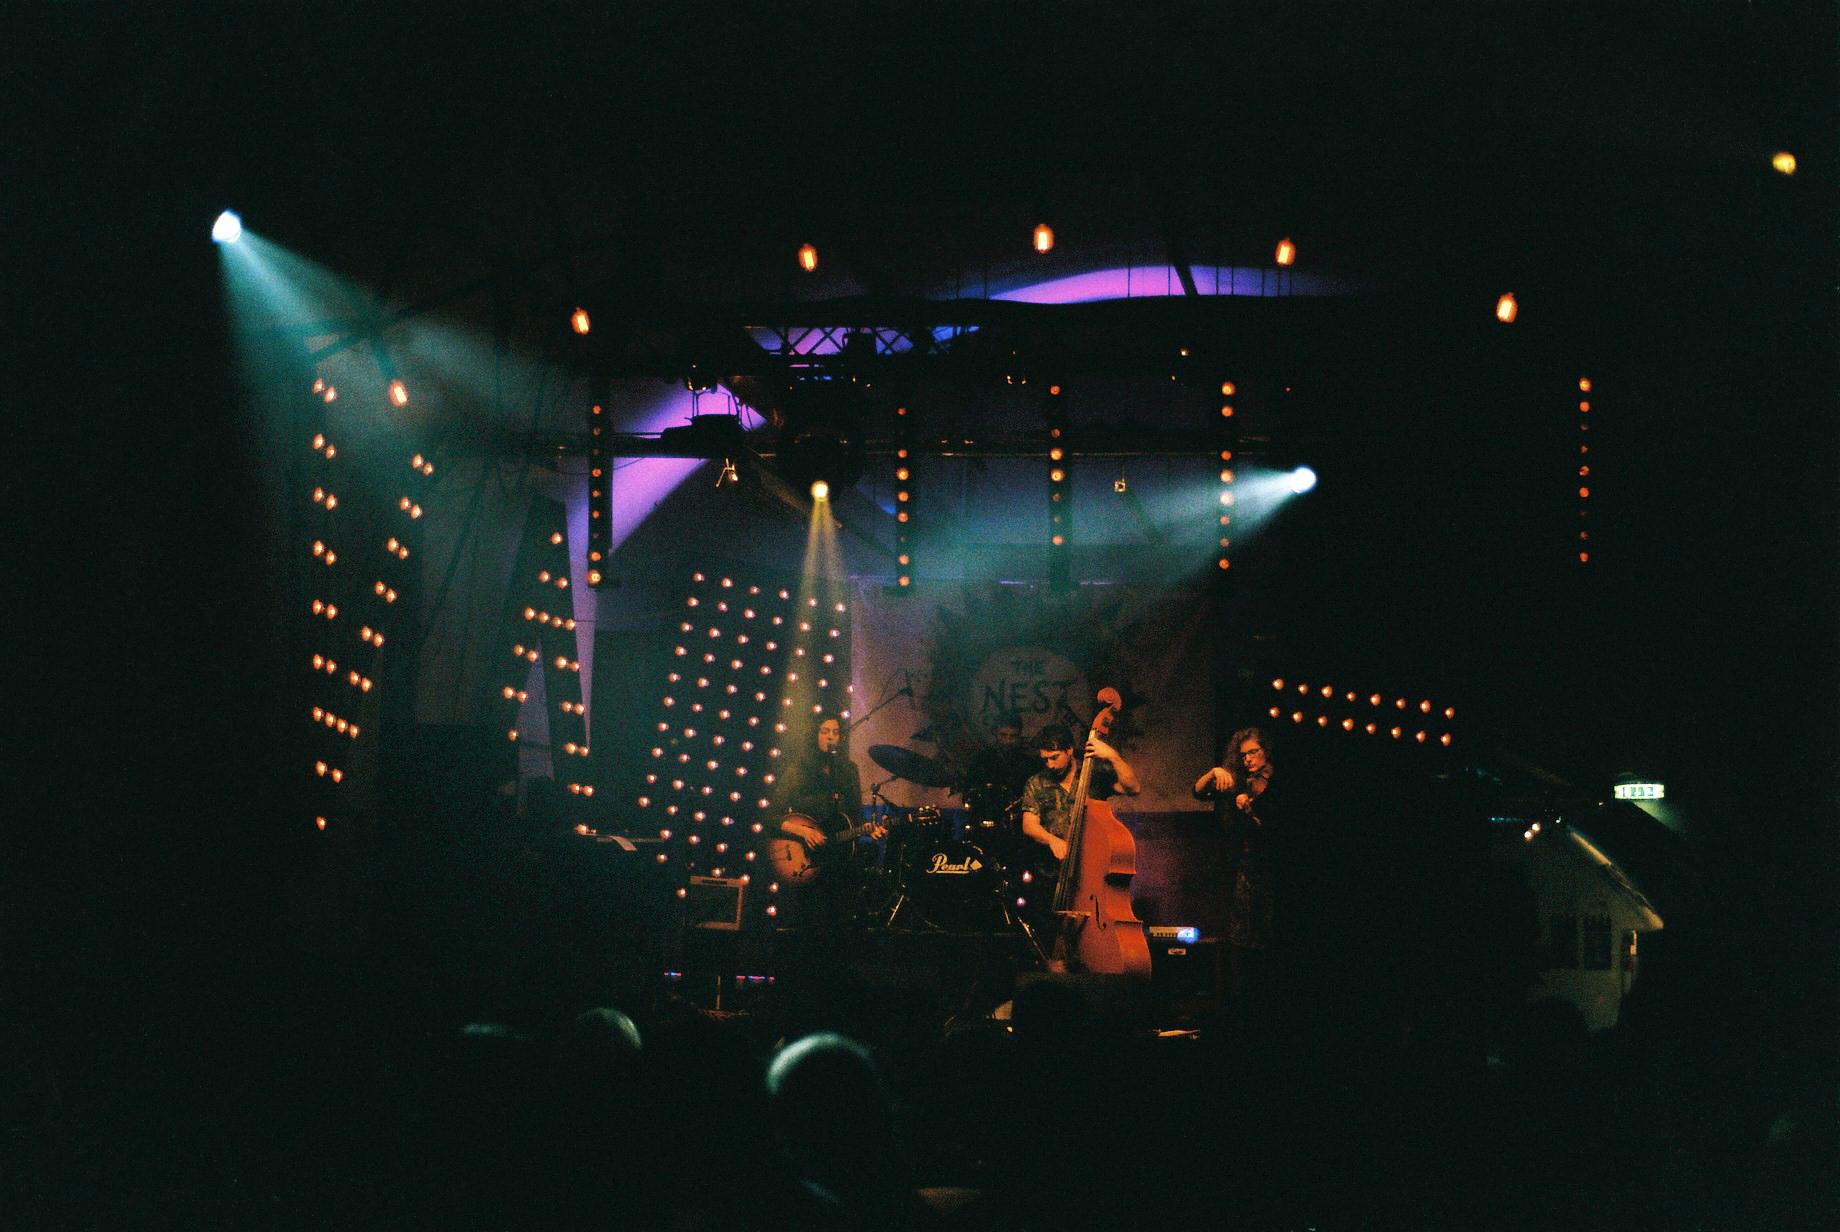 Nest Collective Stage at Vault Festival, London (© Maryam Khastoo)